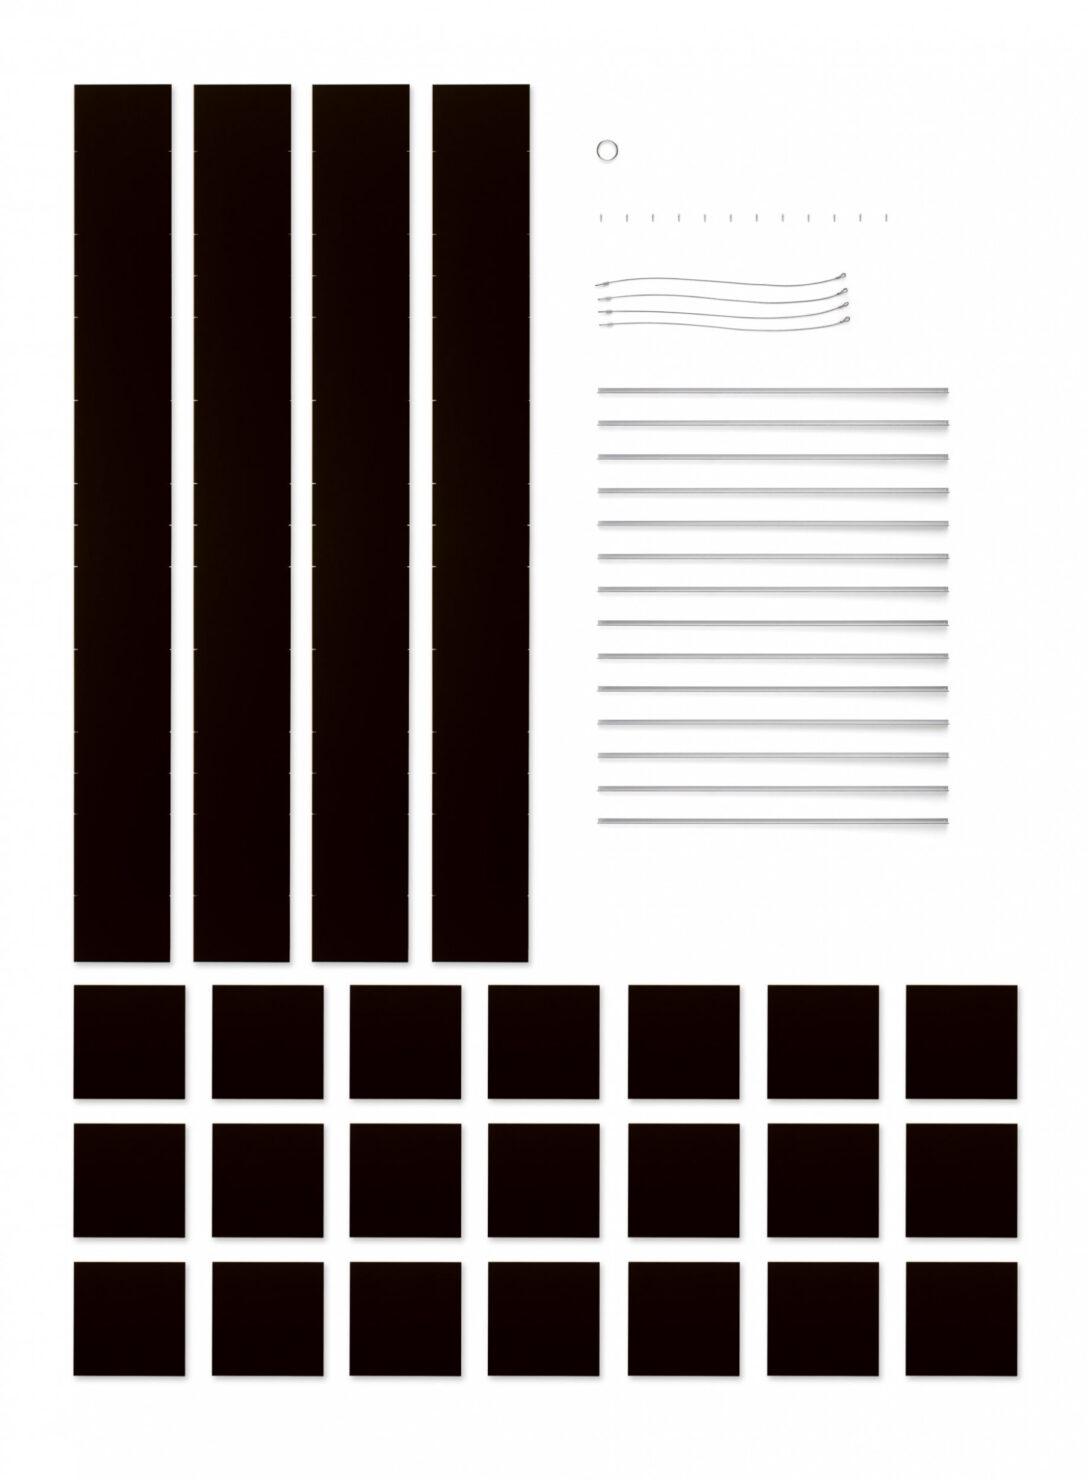 Large Size of Fnp Regal 223 Nils Holger Moormann Einrichten Designde Tiefes Paternoster Blu Ray Regale Metall Wandregal Bad Dvd Selber Bauen Schmale Badezimmer Hochglanz Regal Fnp Regal